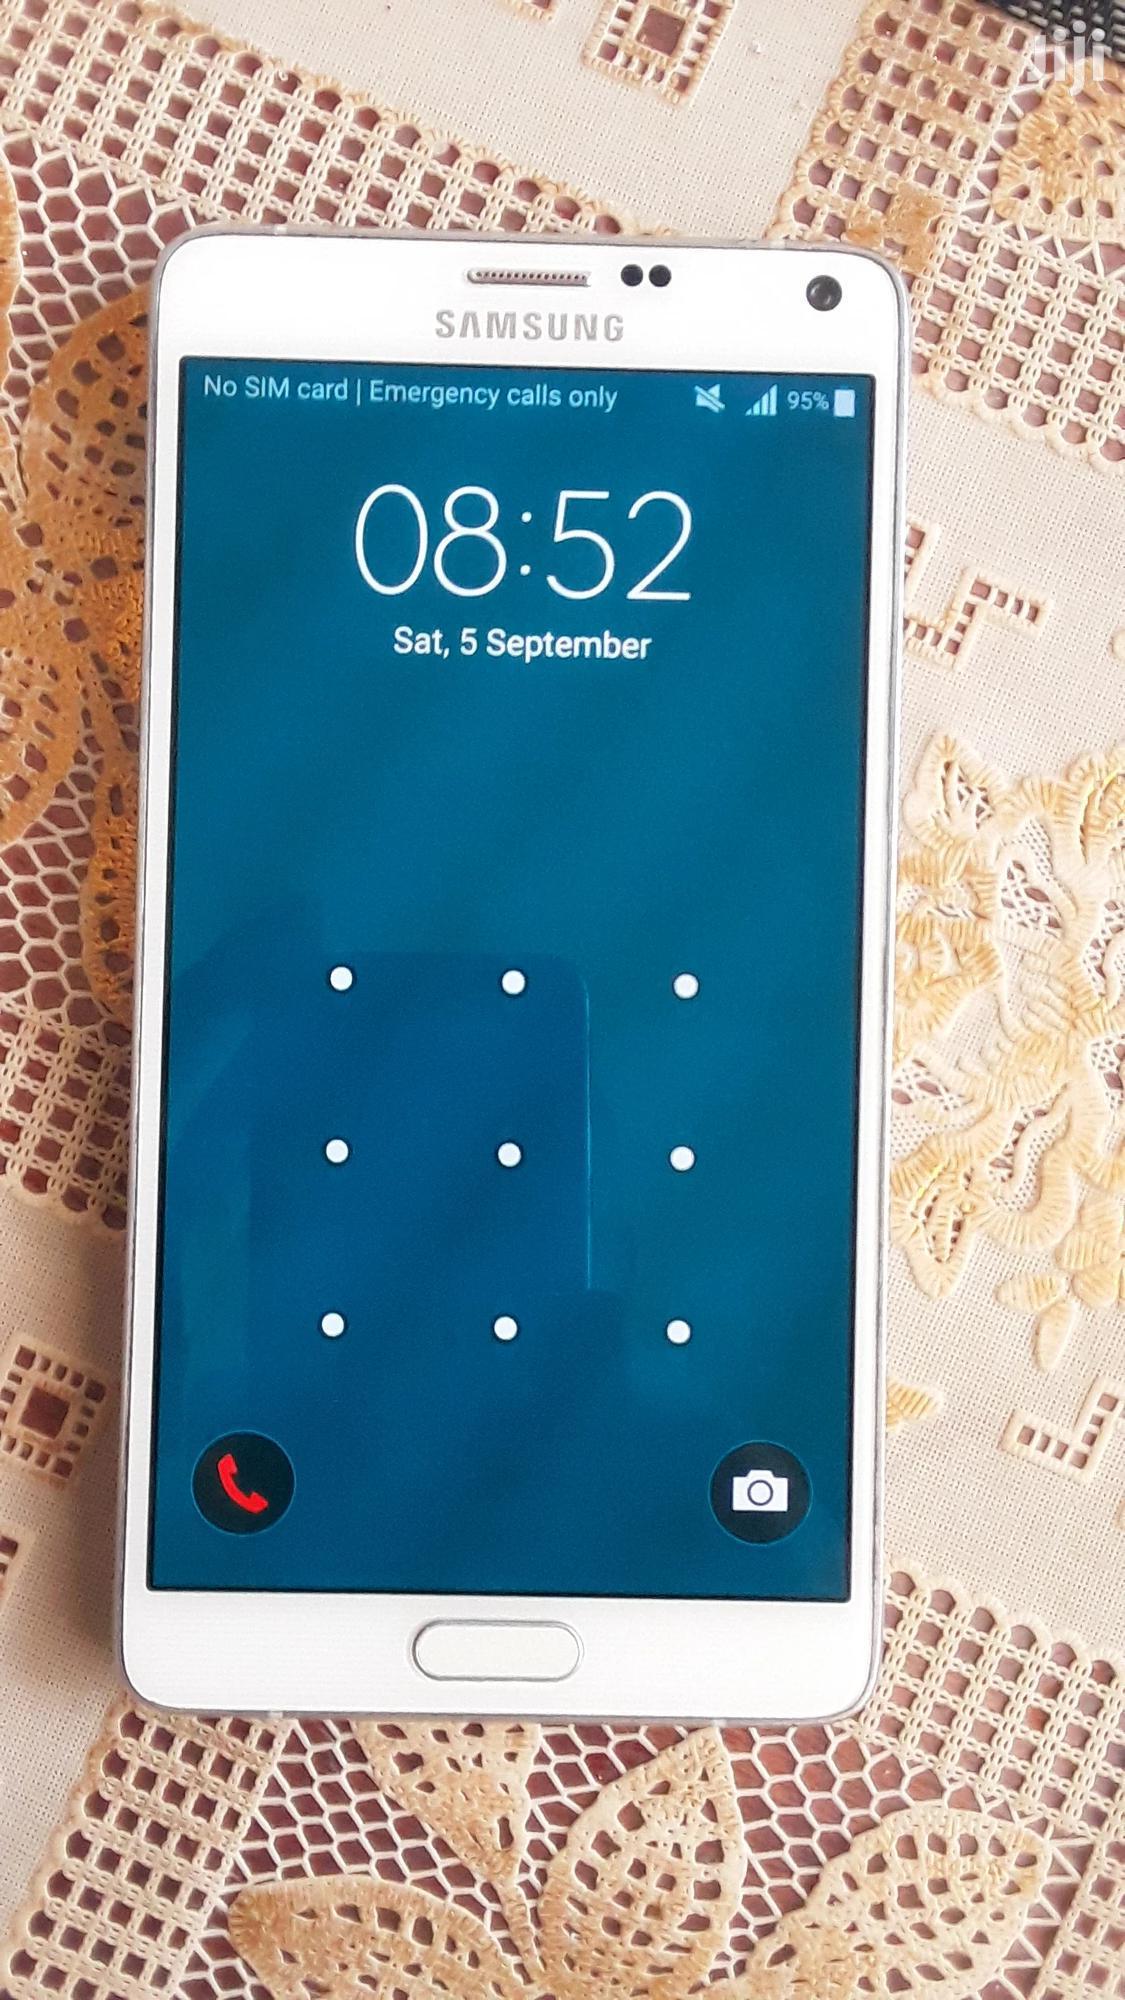 Samsung Galaxy Note 4 32 GB White